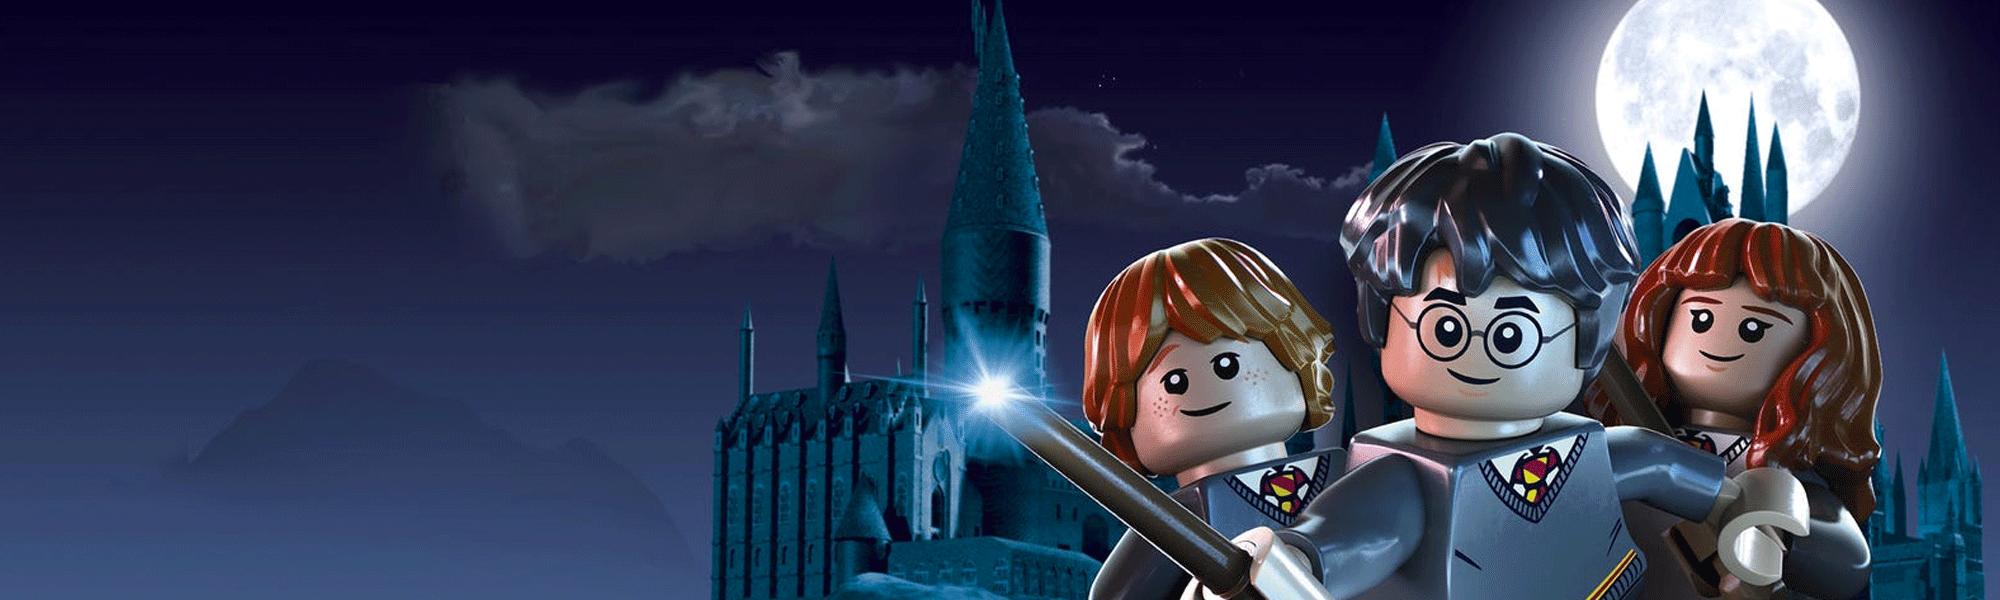 SUPER HERO HARRY POTTER LEGO